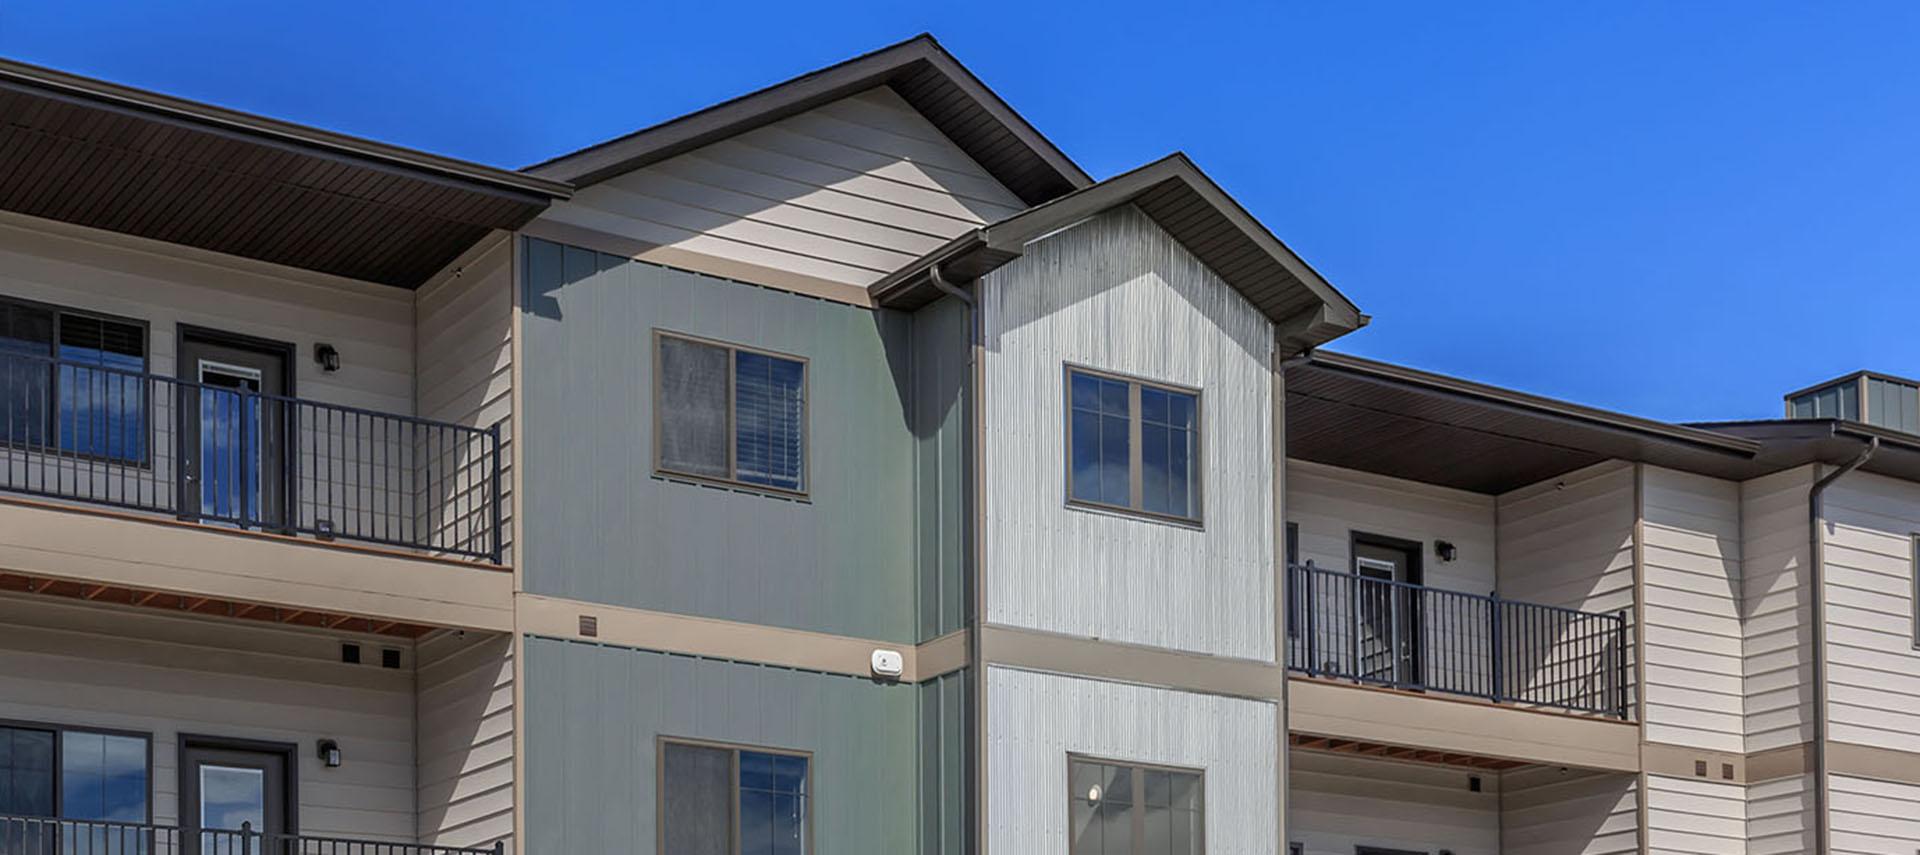 InterUrban Apartment Homes - Apartments in Billings, MT